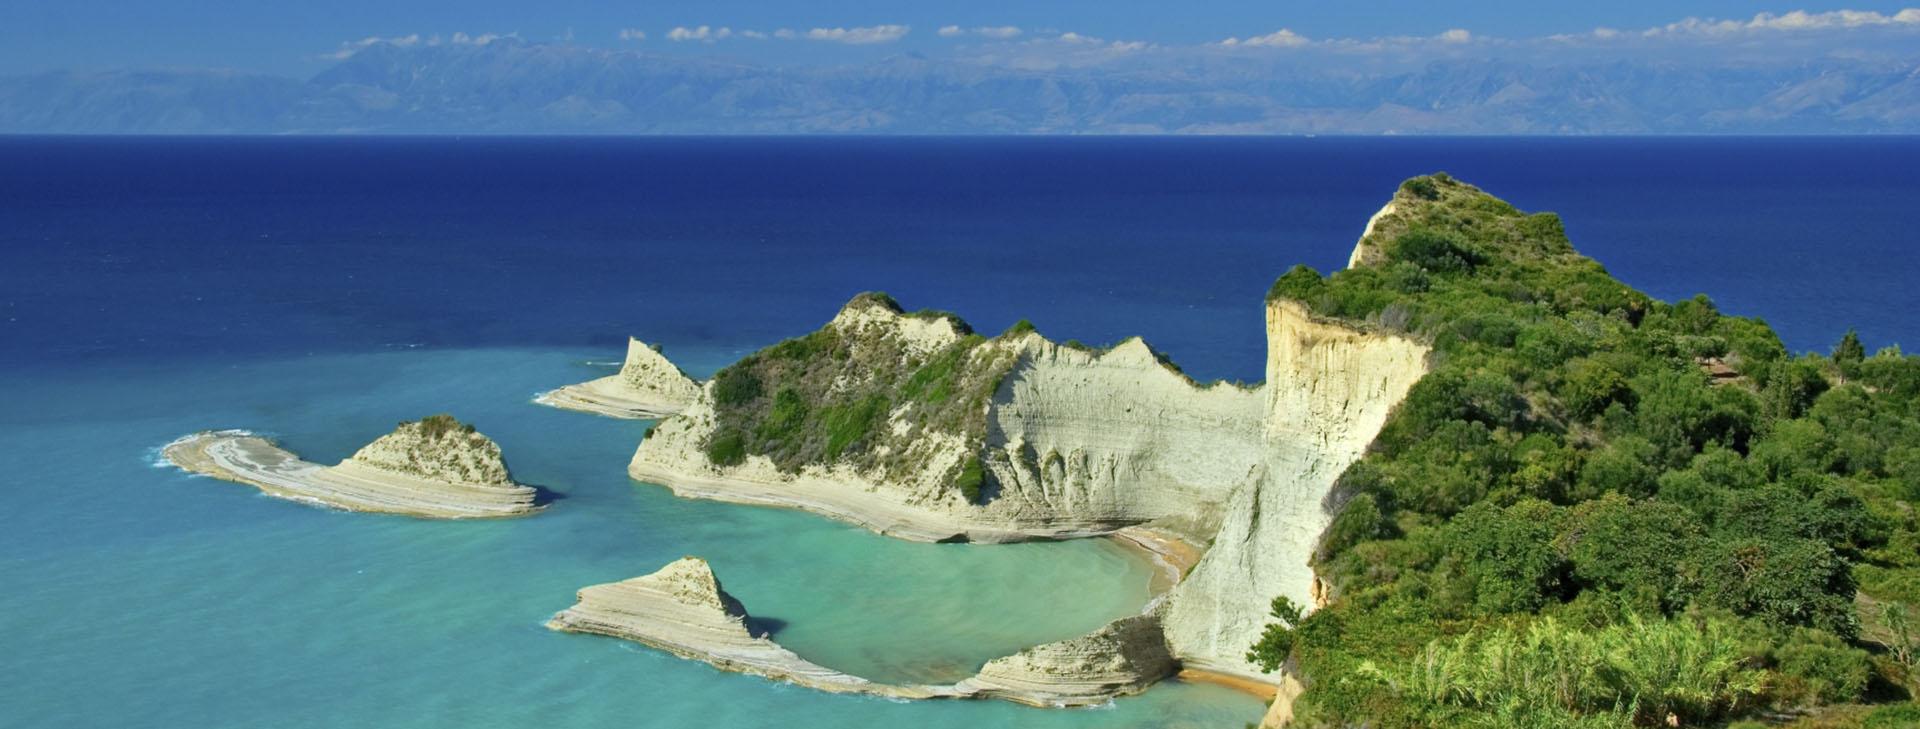 Beach of Corfu island